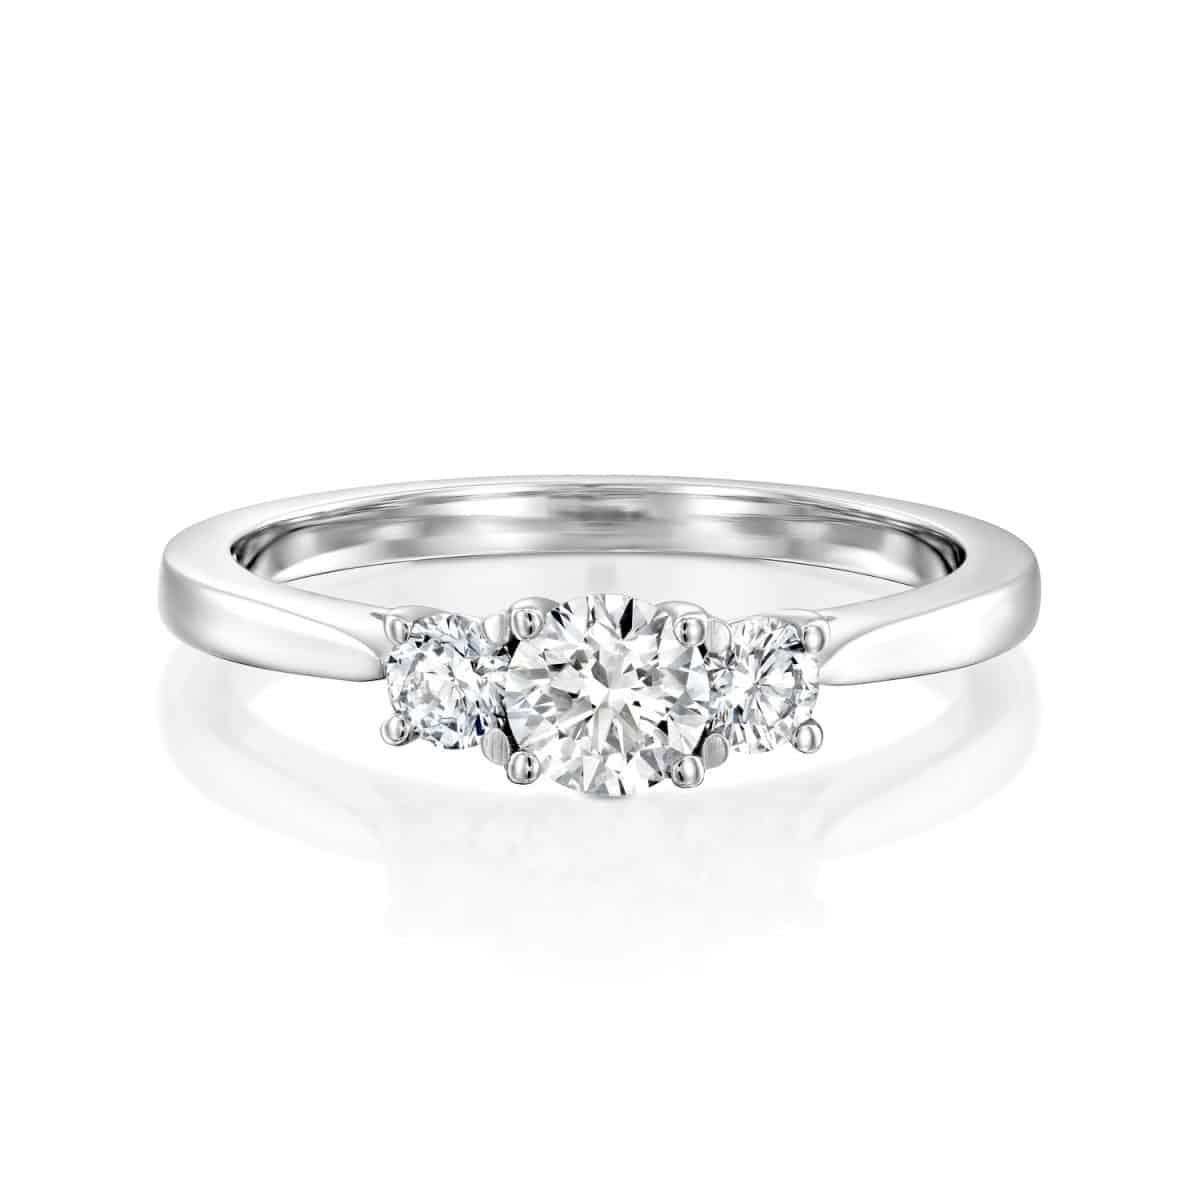 Bar - White Gold Lab Grown Diamond Engagement Ring 0.50ct. - top